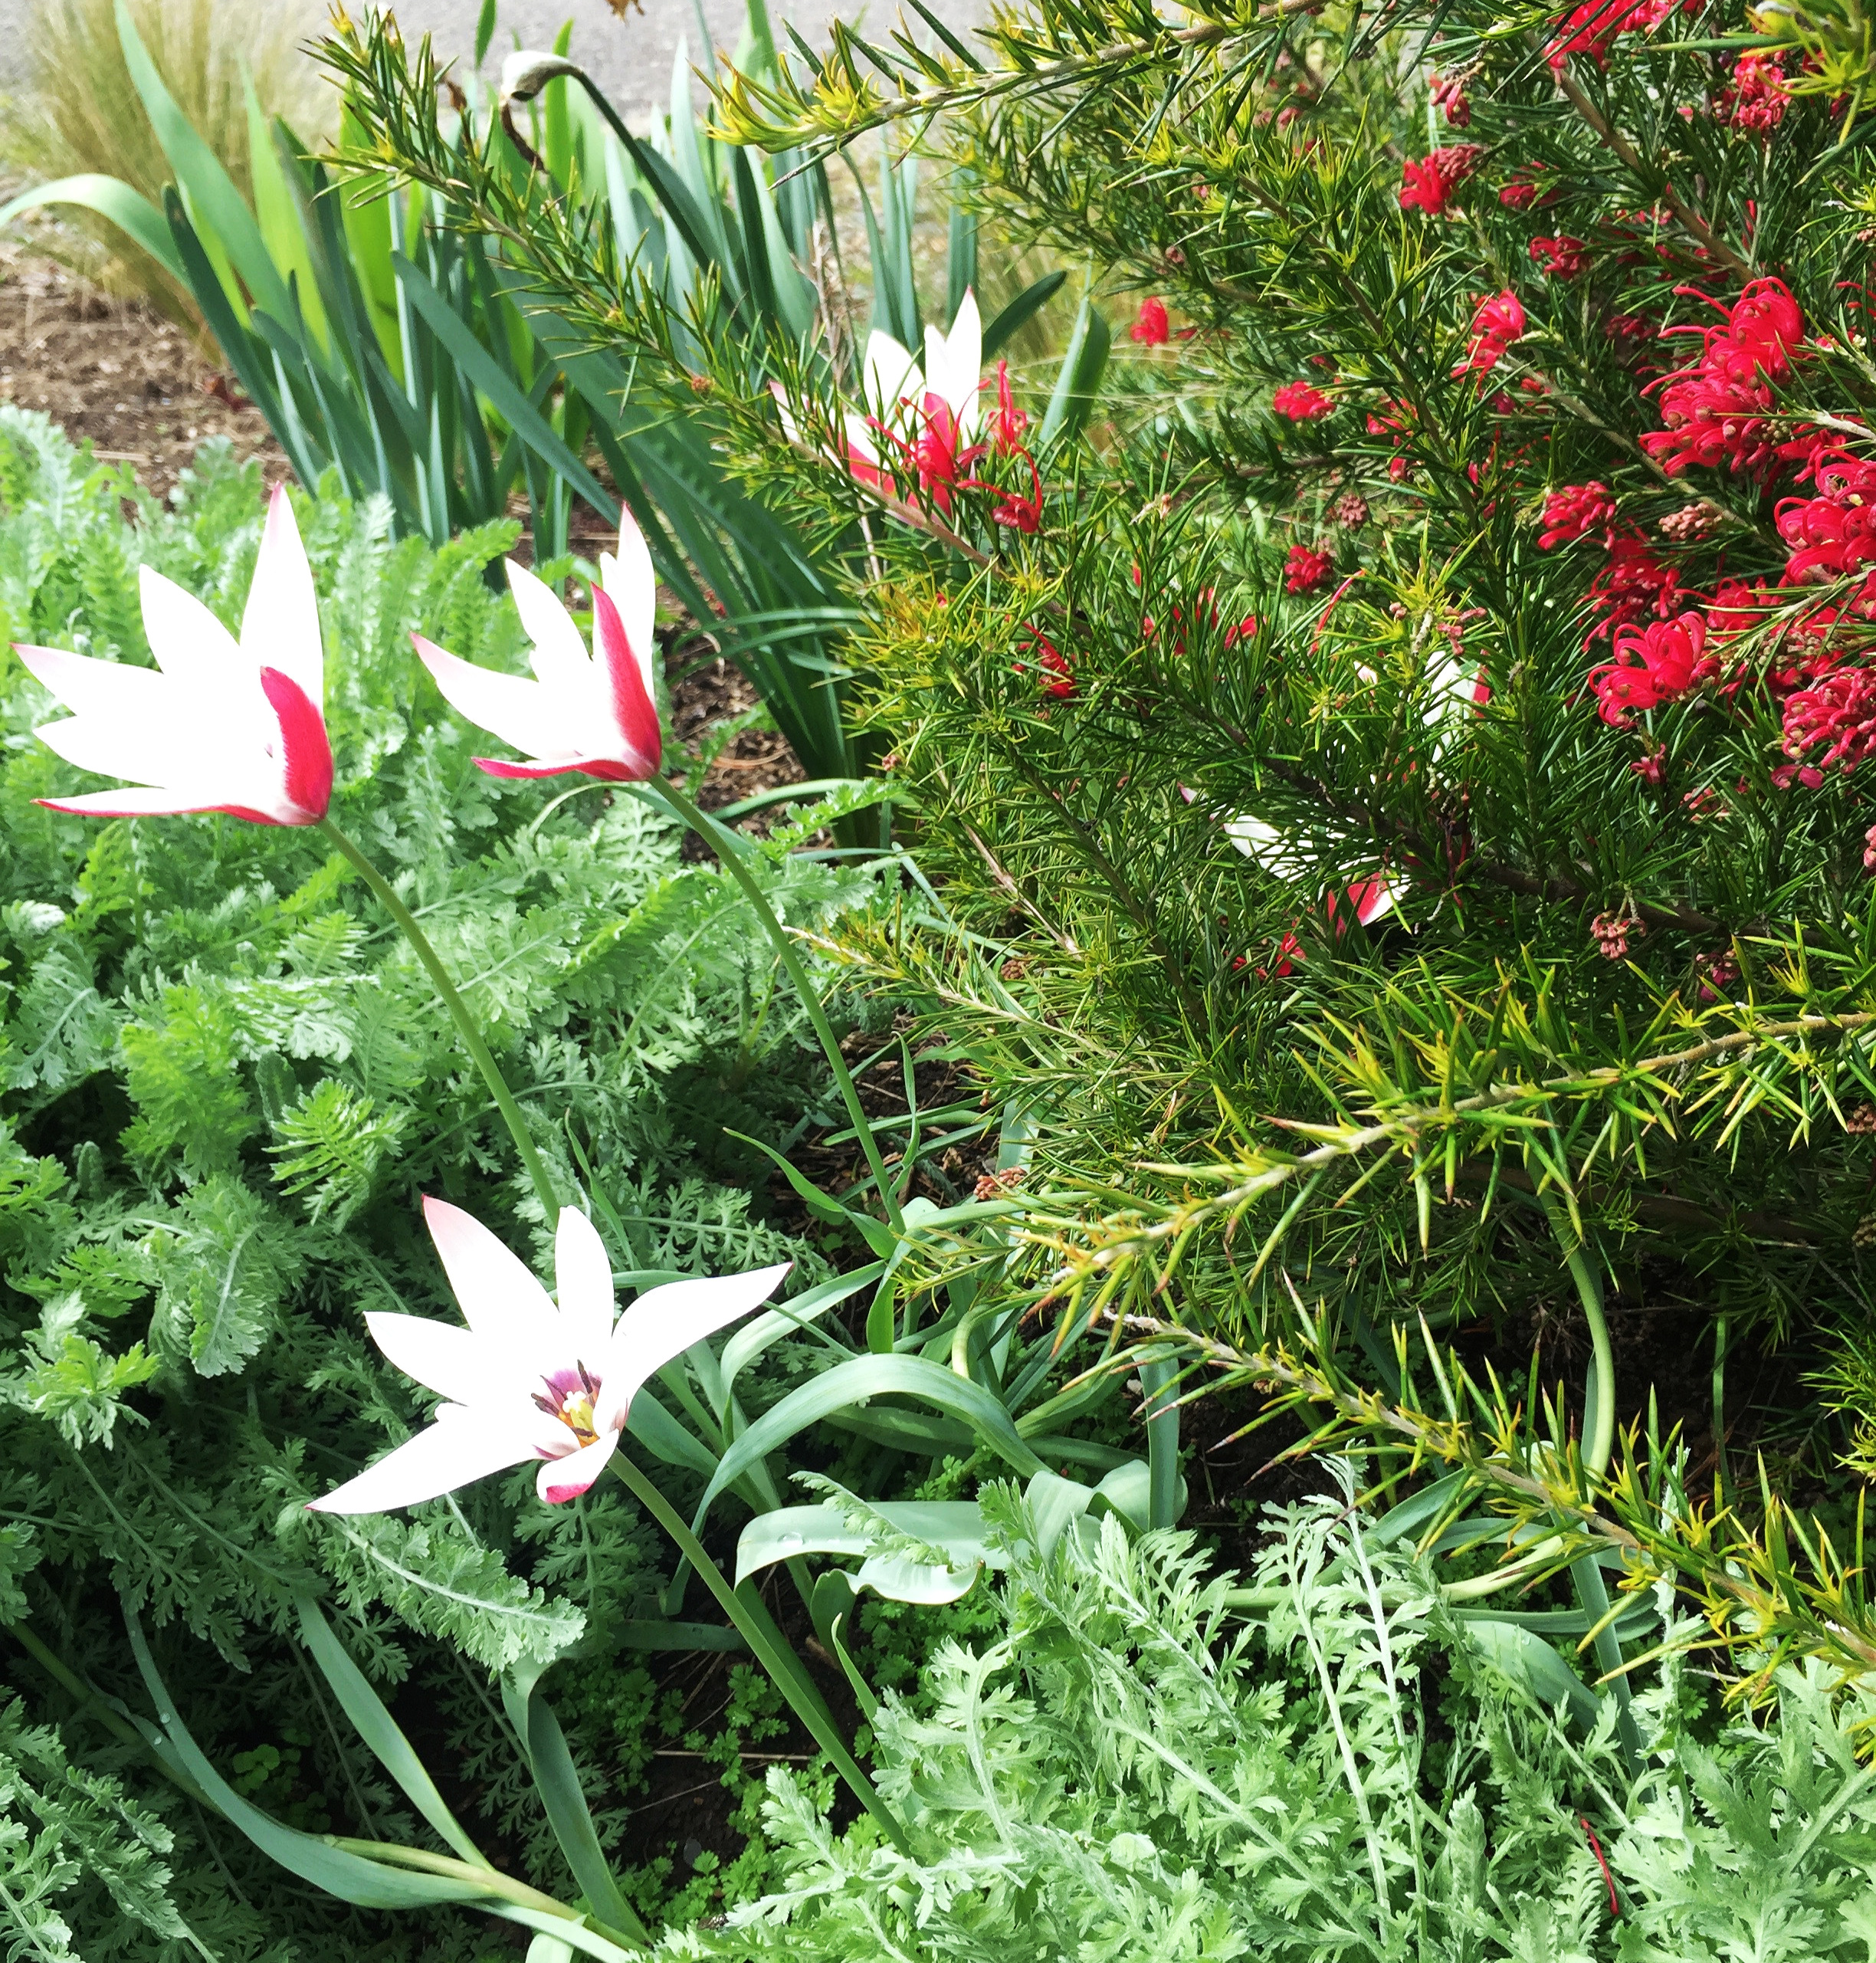 Grevillea 'Canberra Gem', Tulip 'Peppermint Stick, amidst fern-like silver foliage of Achillea 'Moonshine'